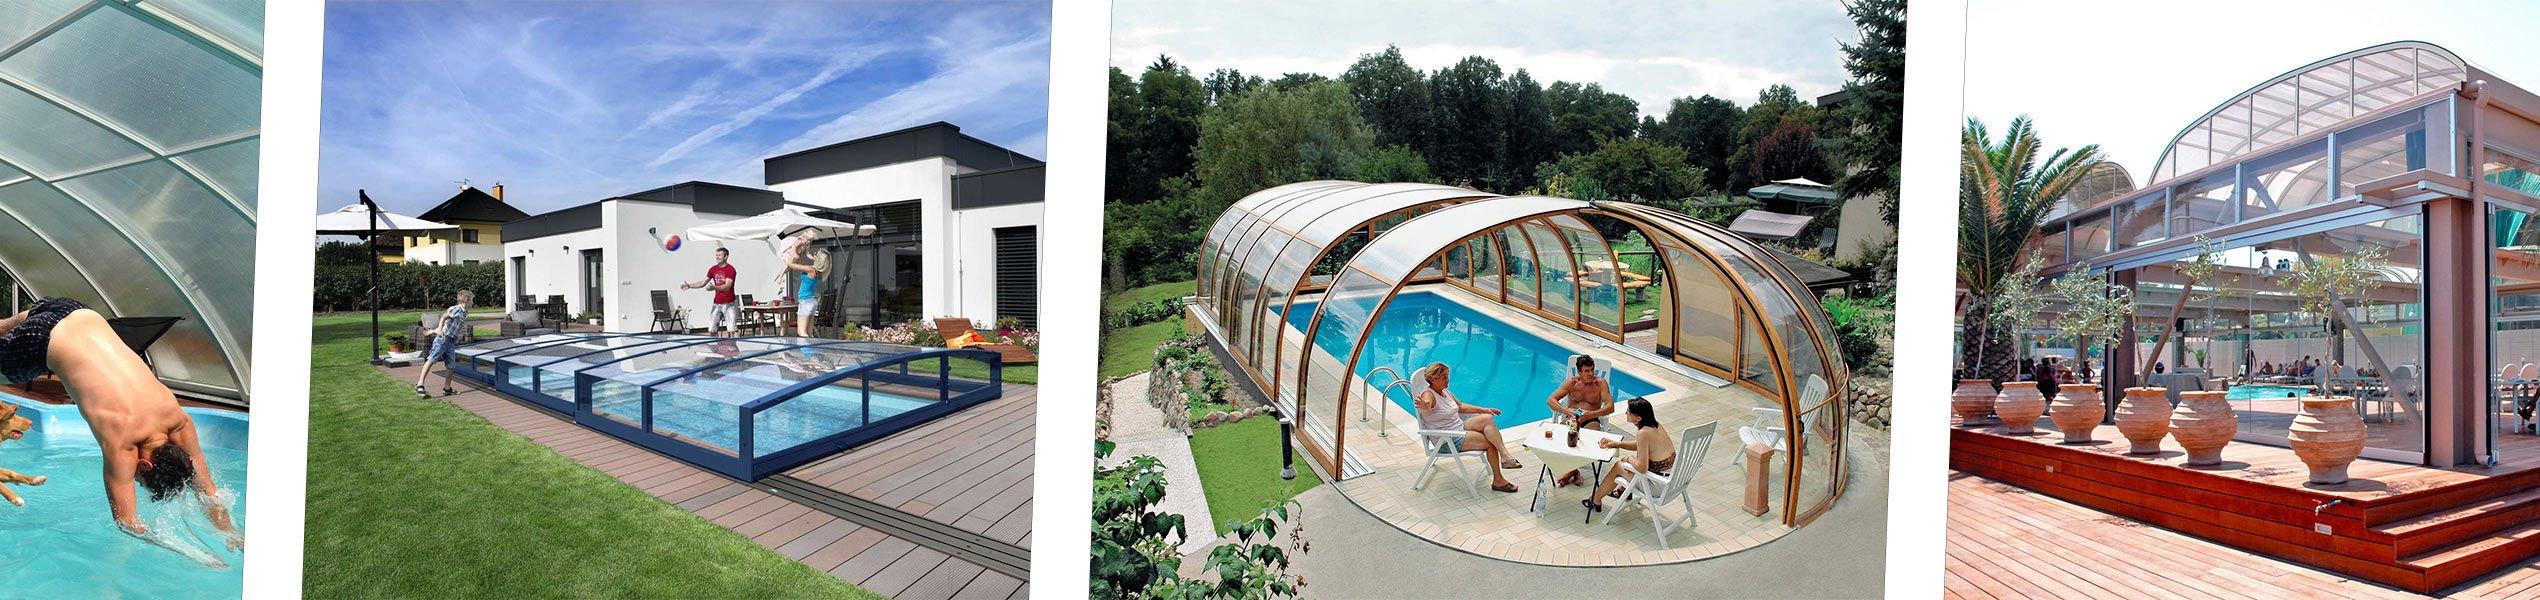 Pool enclosures photo gallery